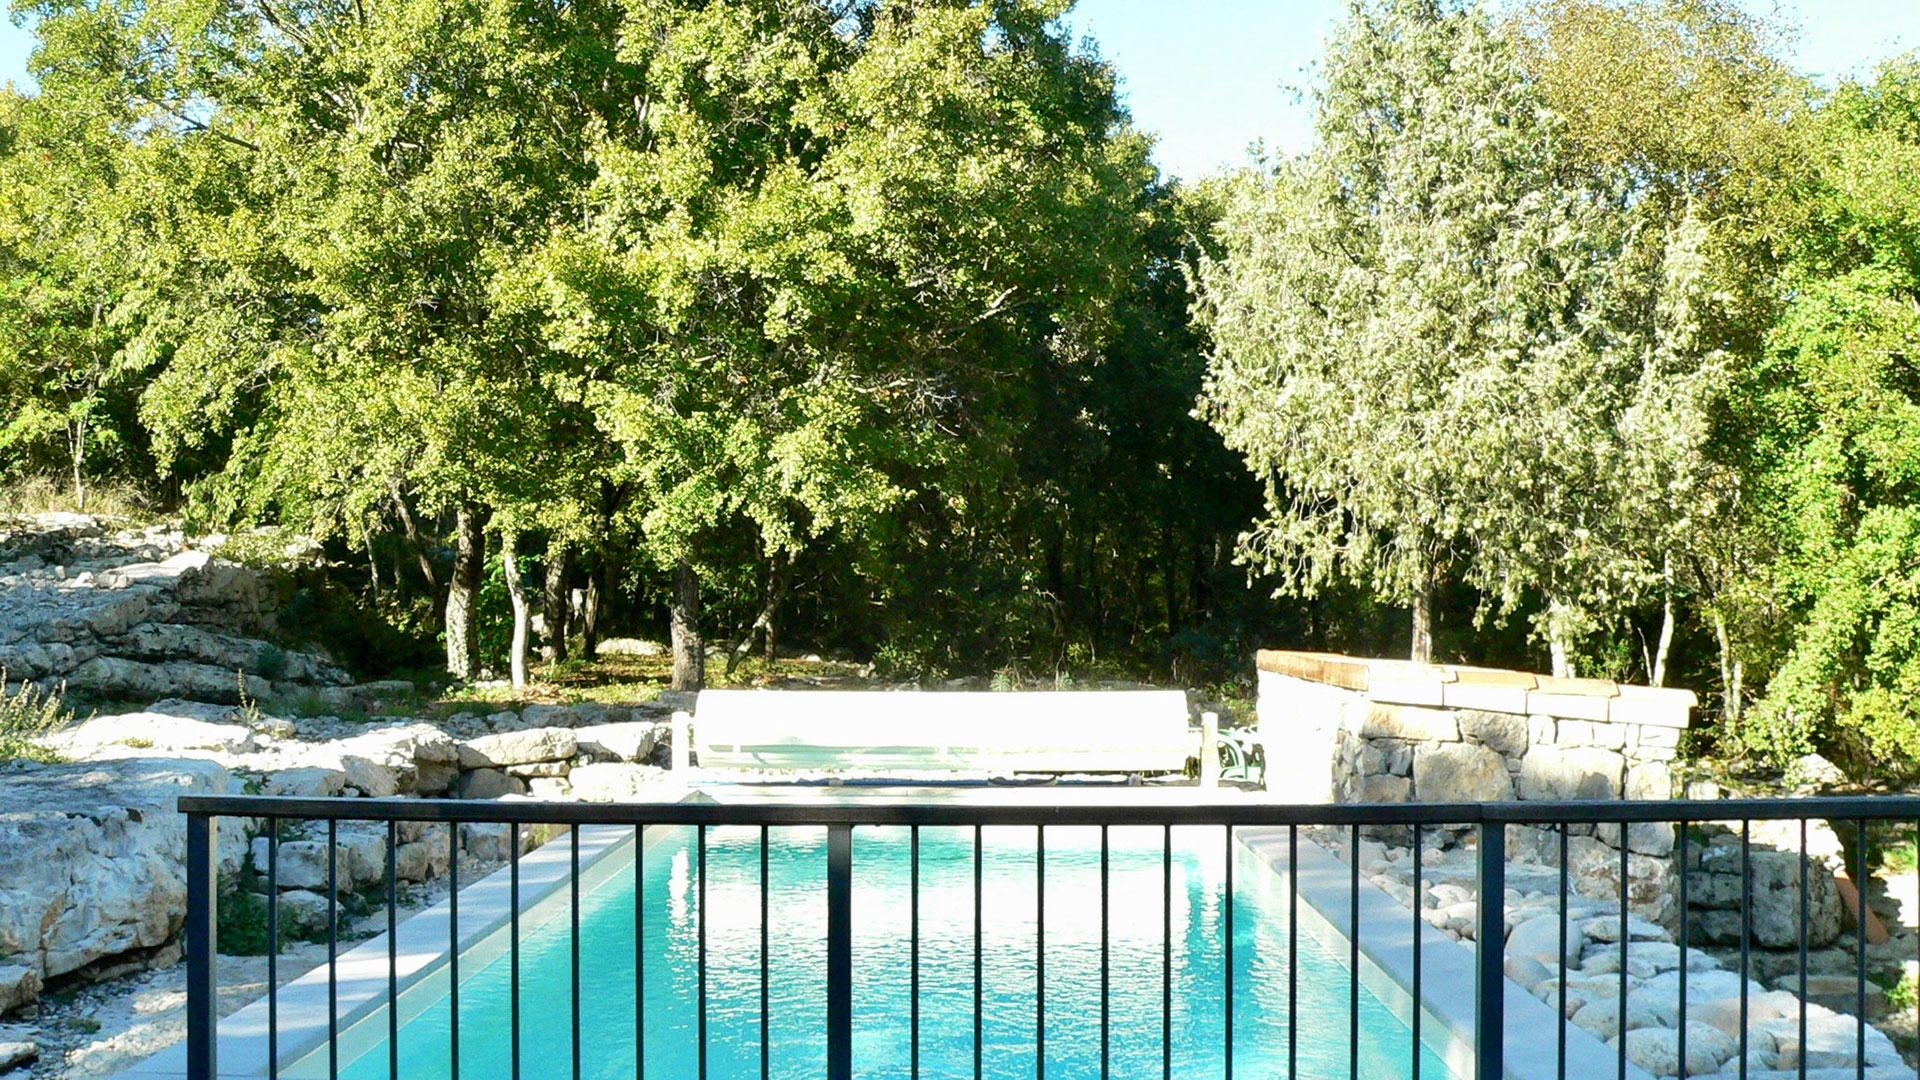 Outdoor Pool - Gite Danila & Renzo intérieur Piscine Lablachere